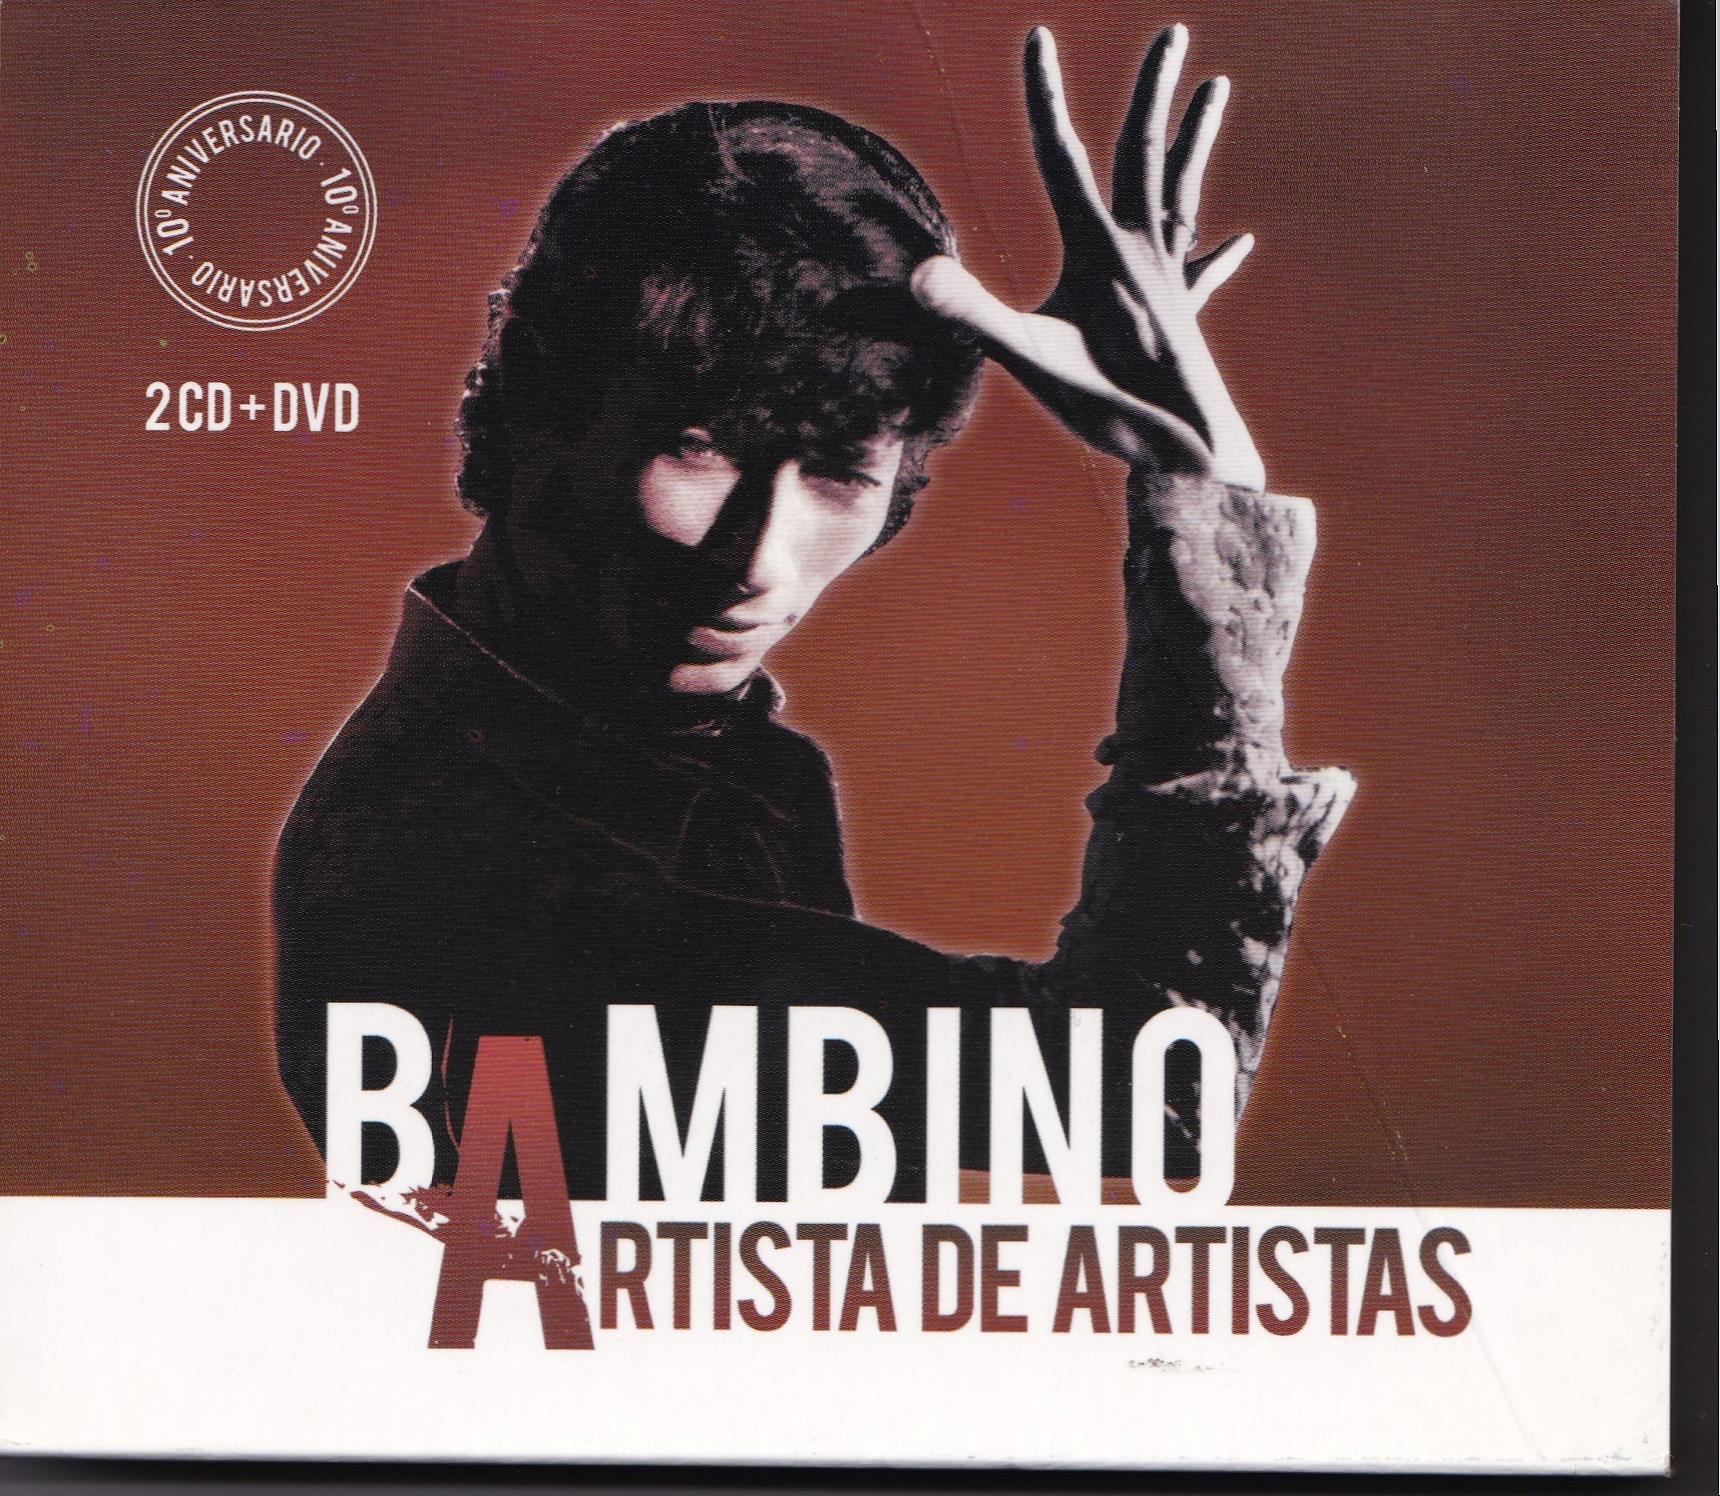 2-CD 10 ANIVERSARIO fallecimiento de BAMBINO que incluye TODO CORAZÓN.